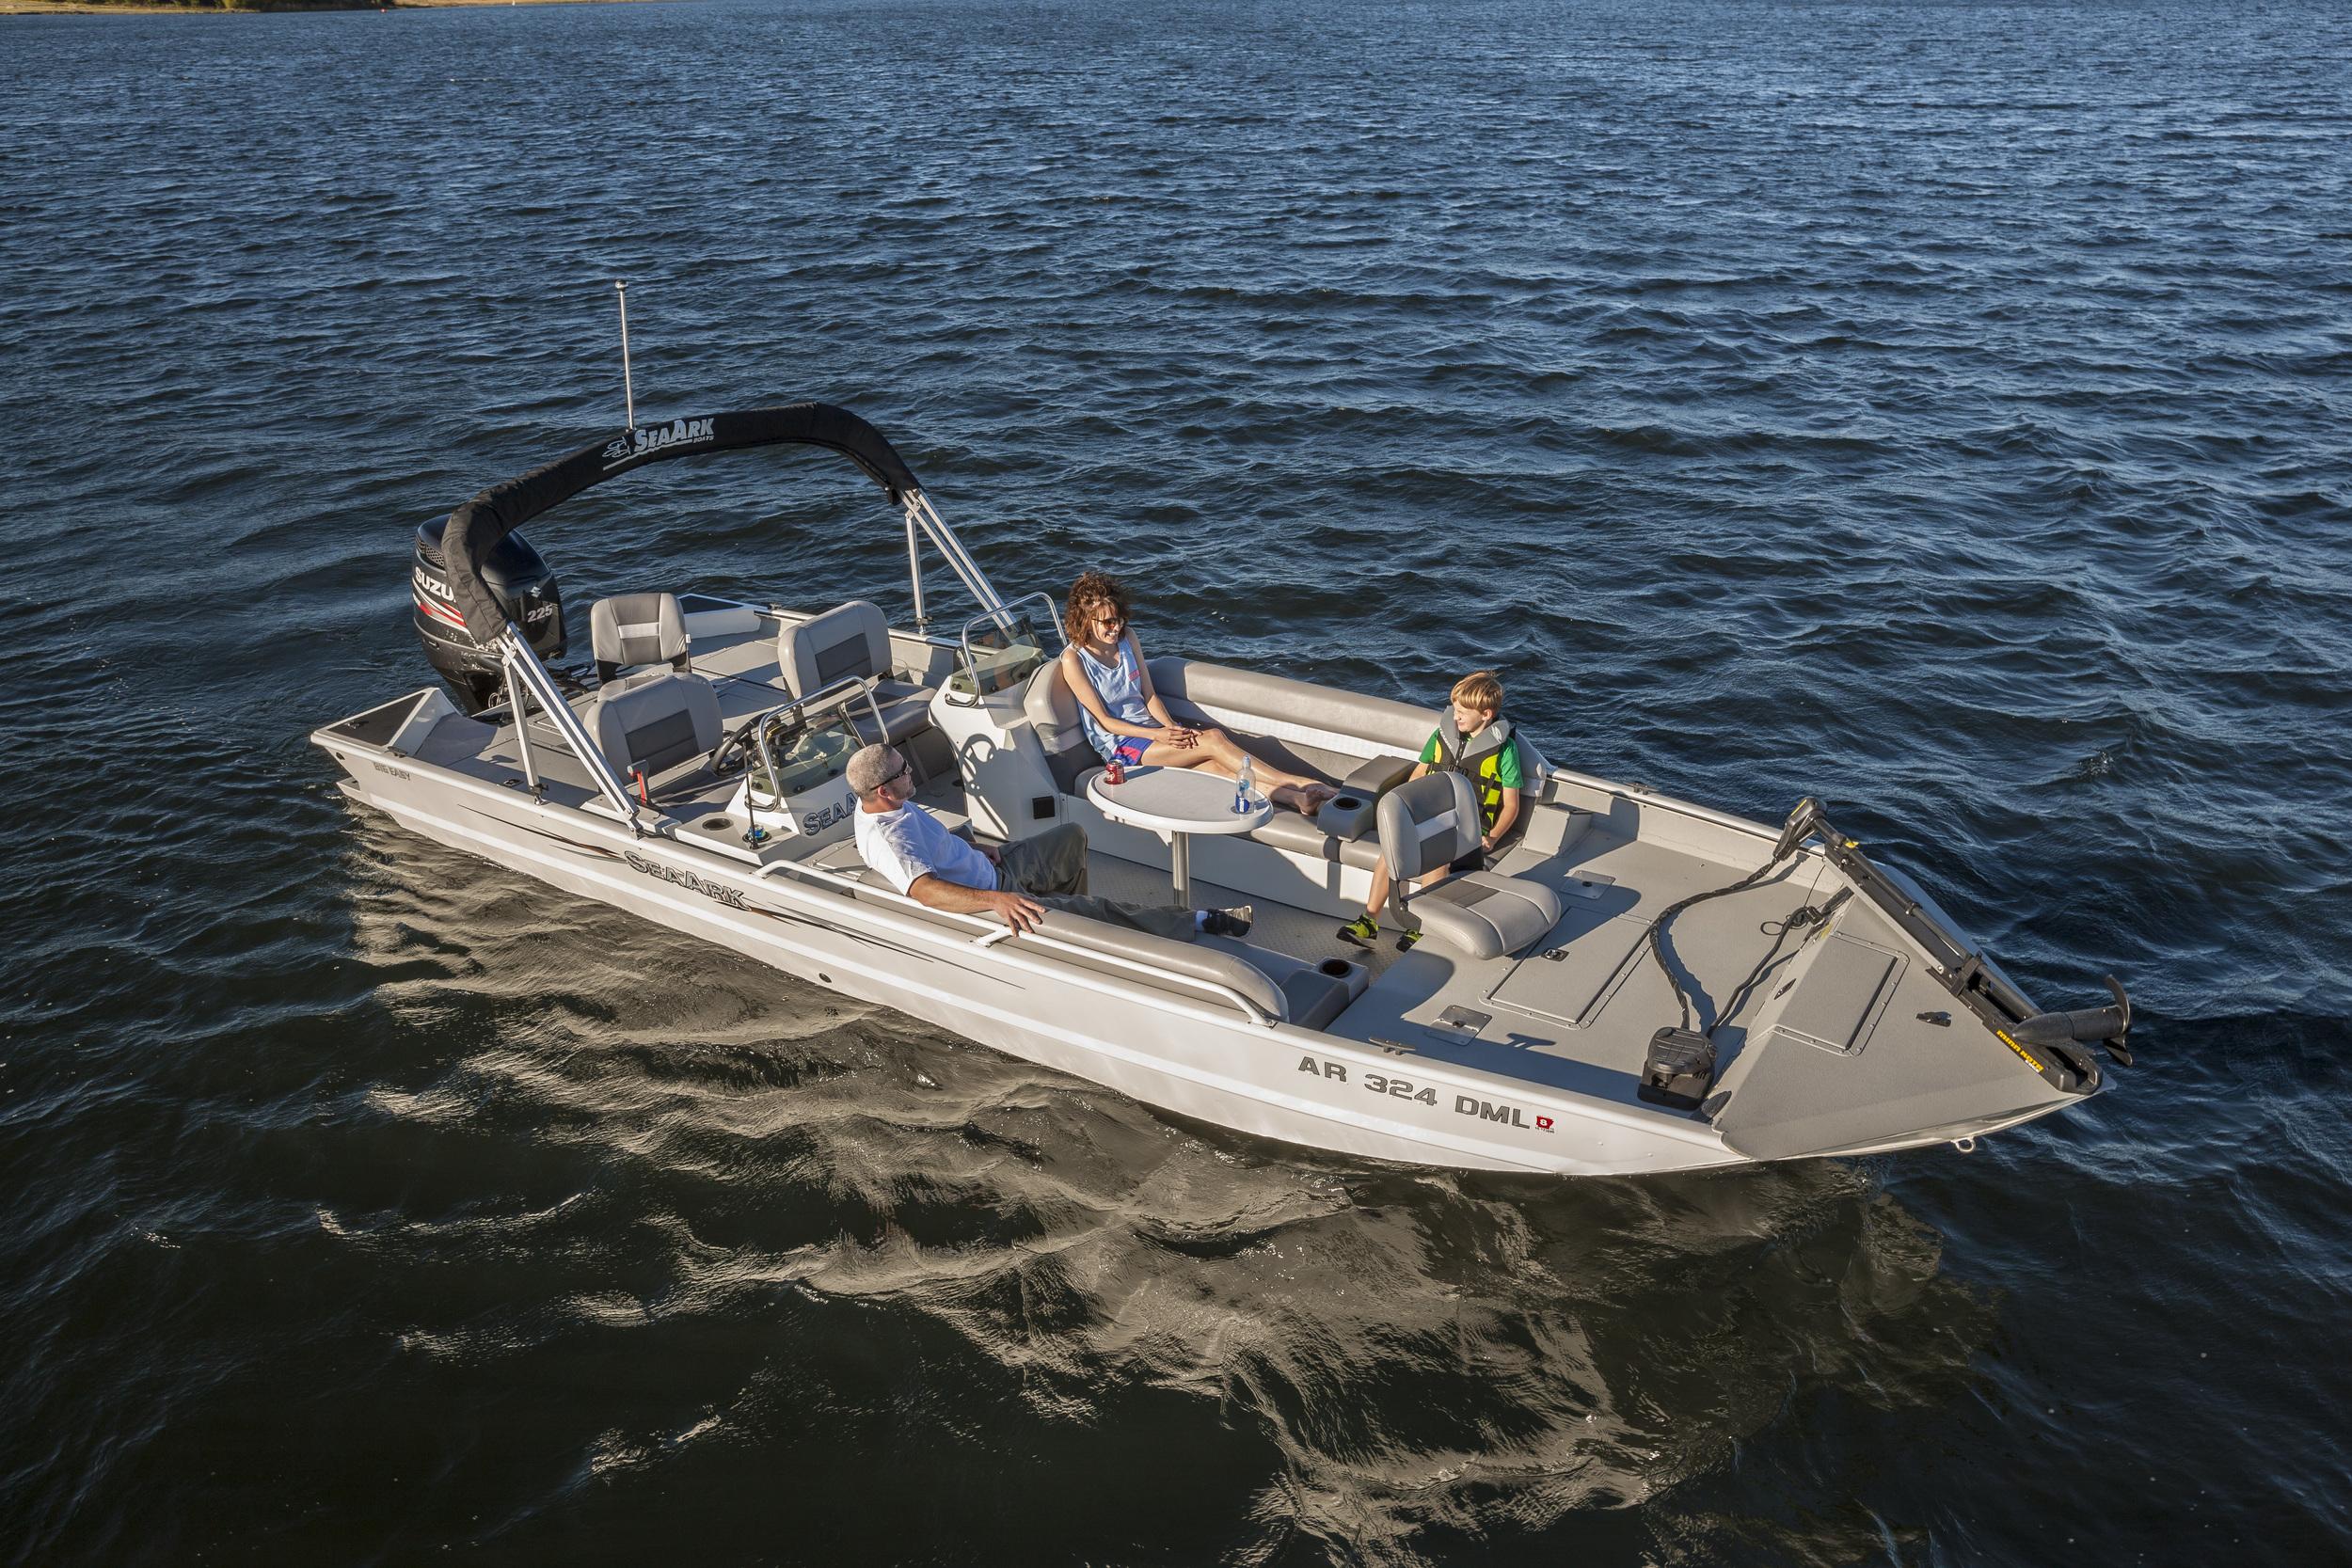 Photos courtesy of Seaark Boats